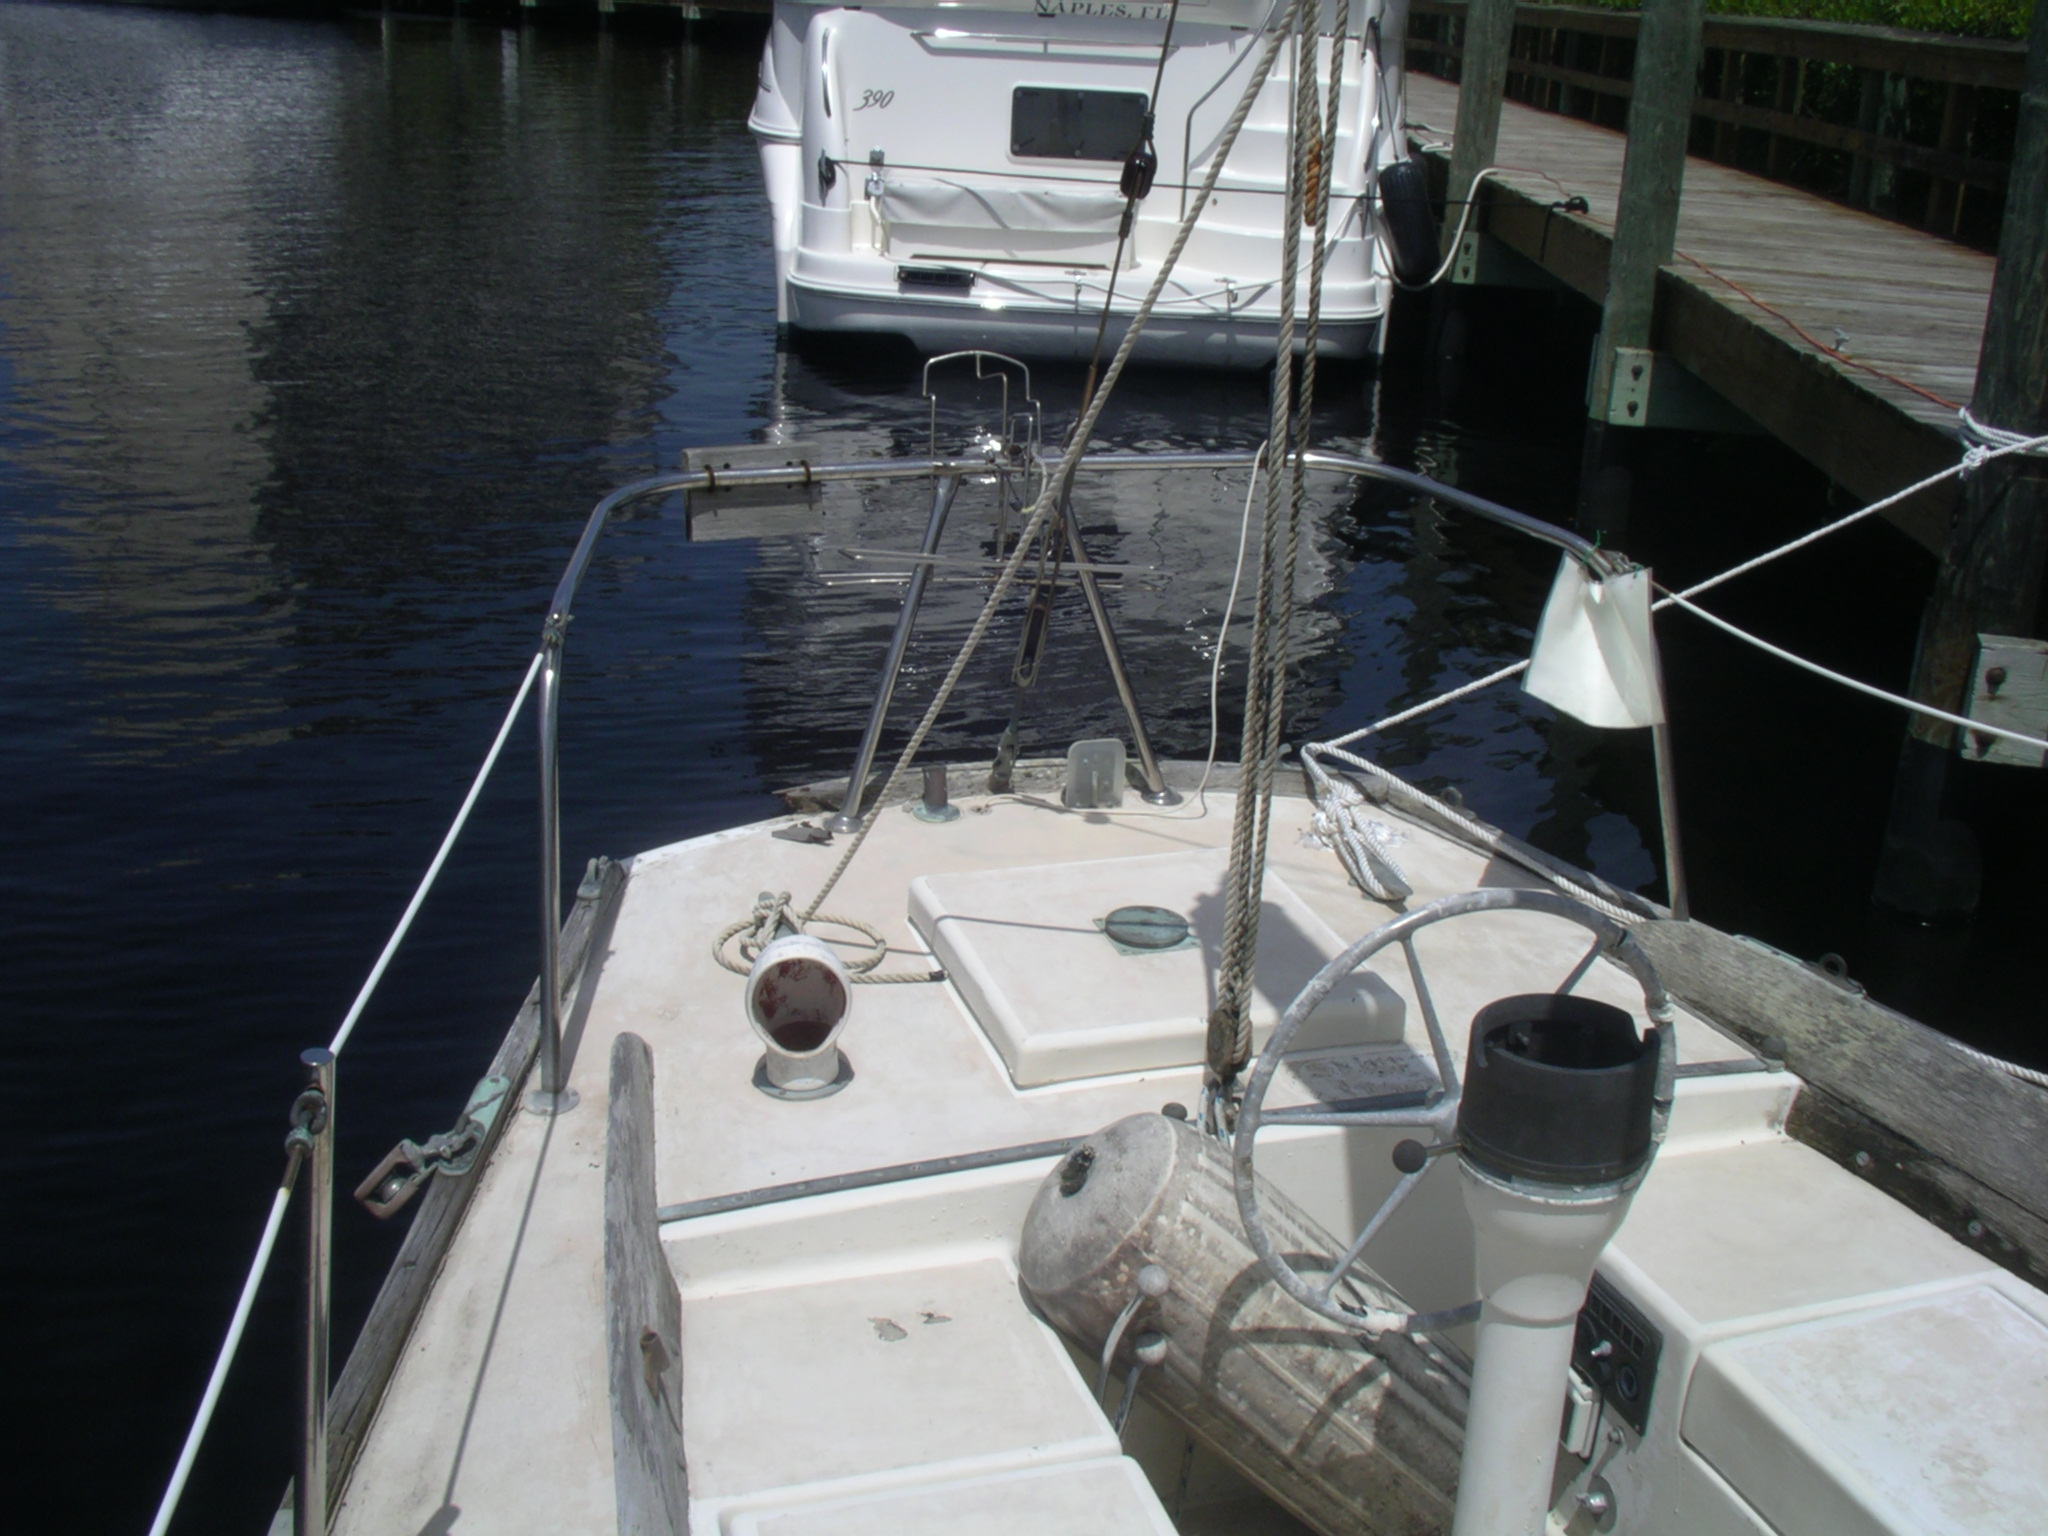 BoatDeck_July2010 (4).JPG